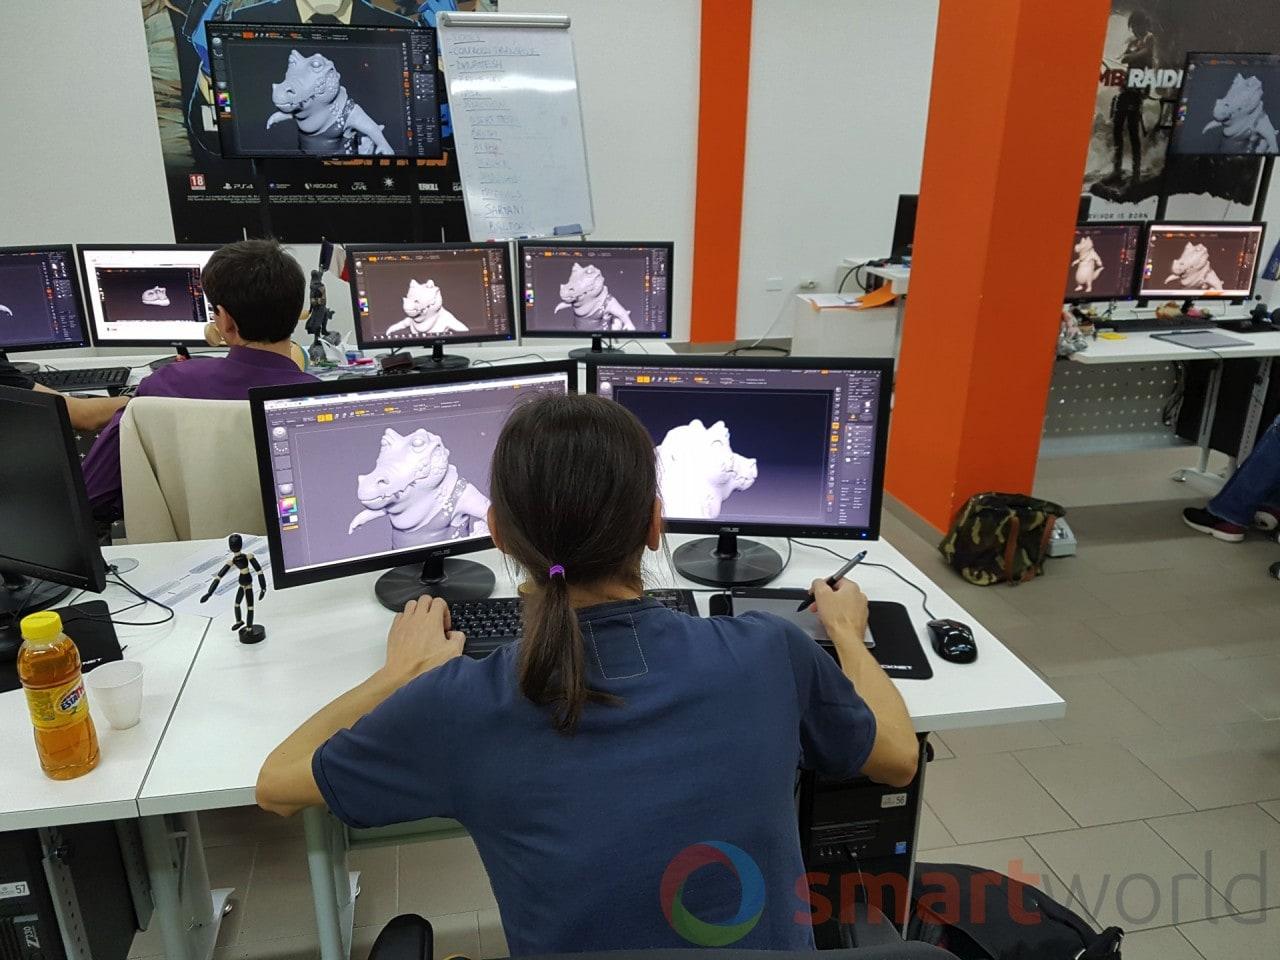 Digital Bros Game Academy Visita - 3